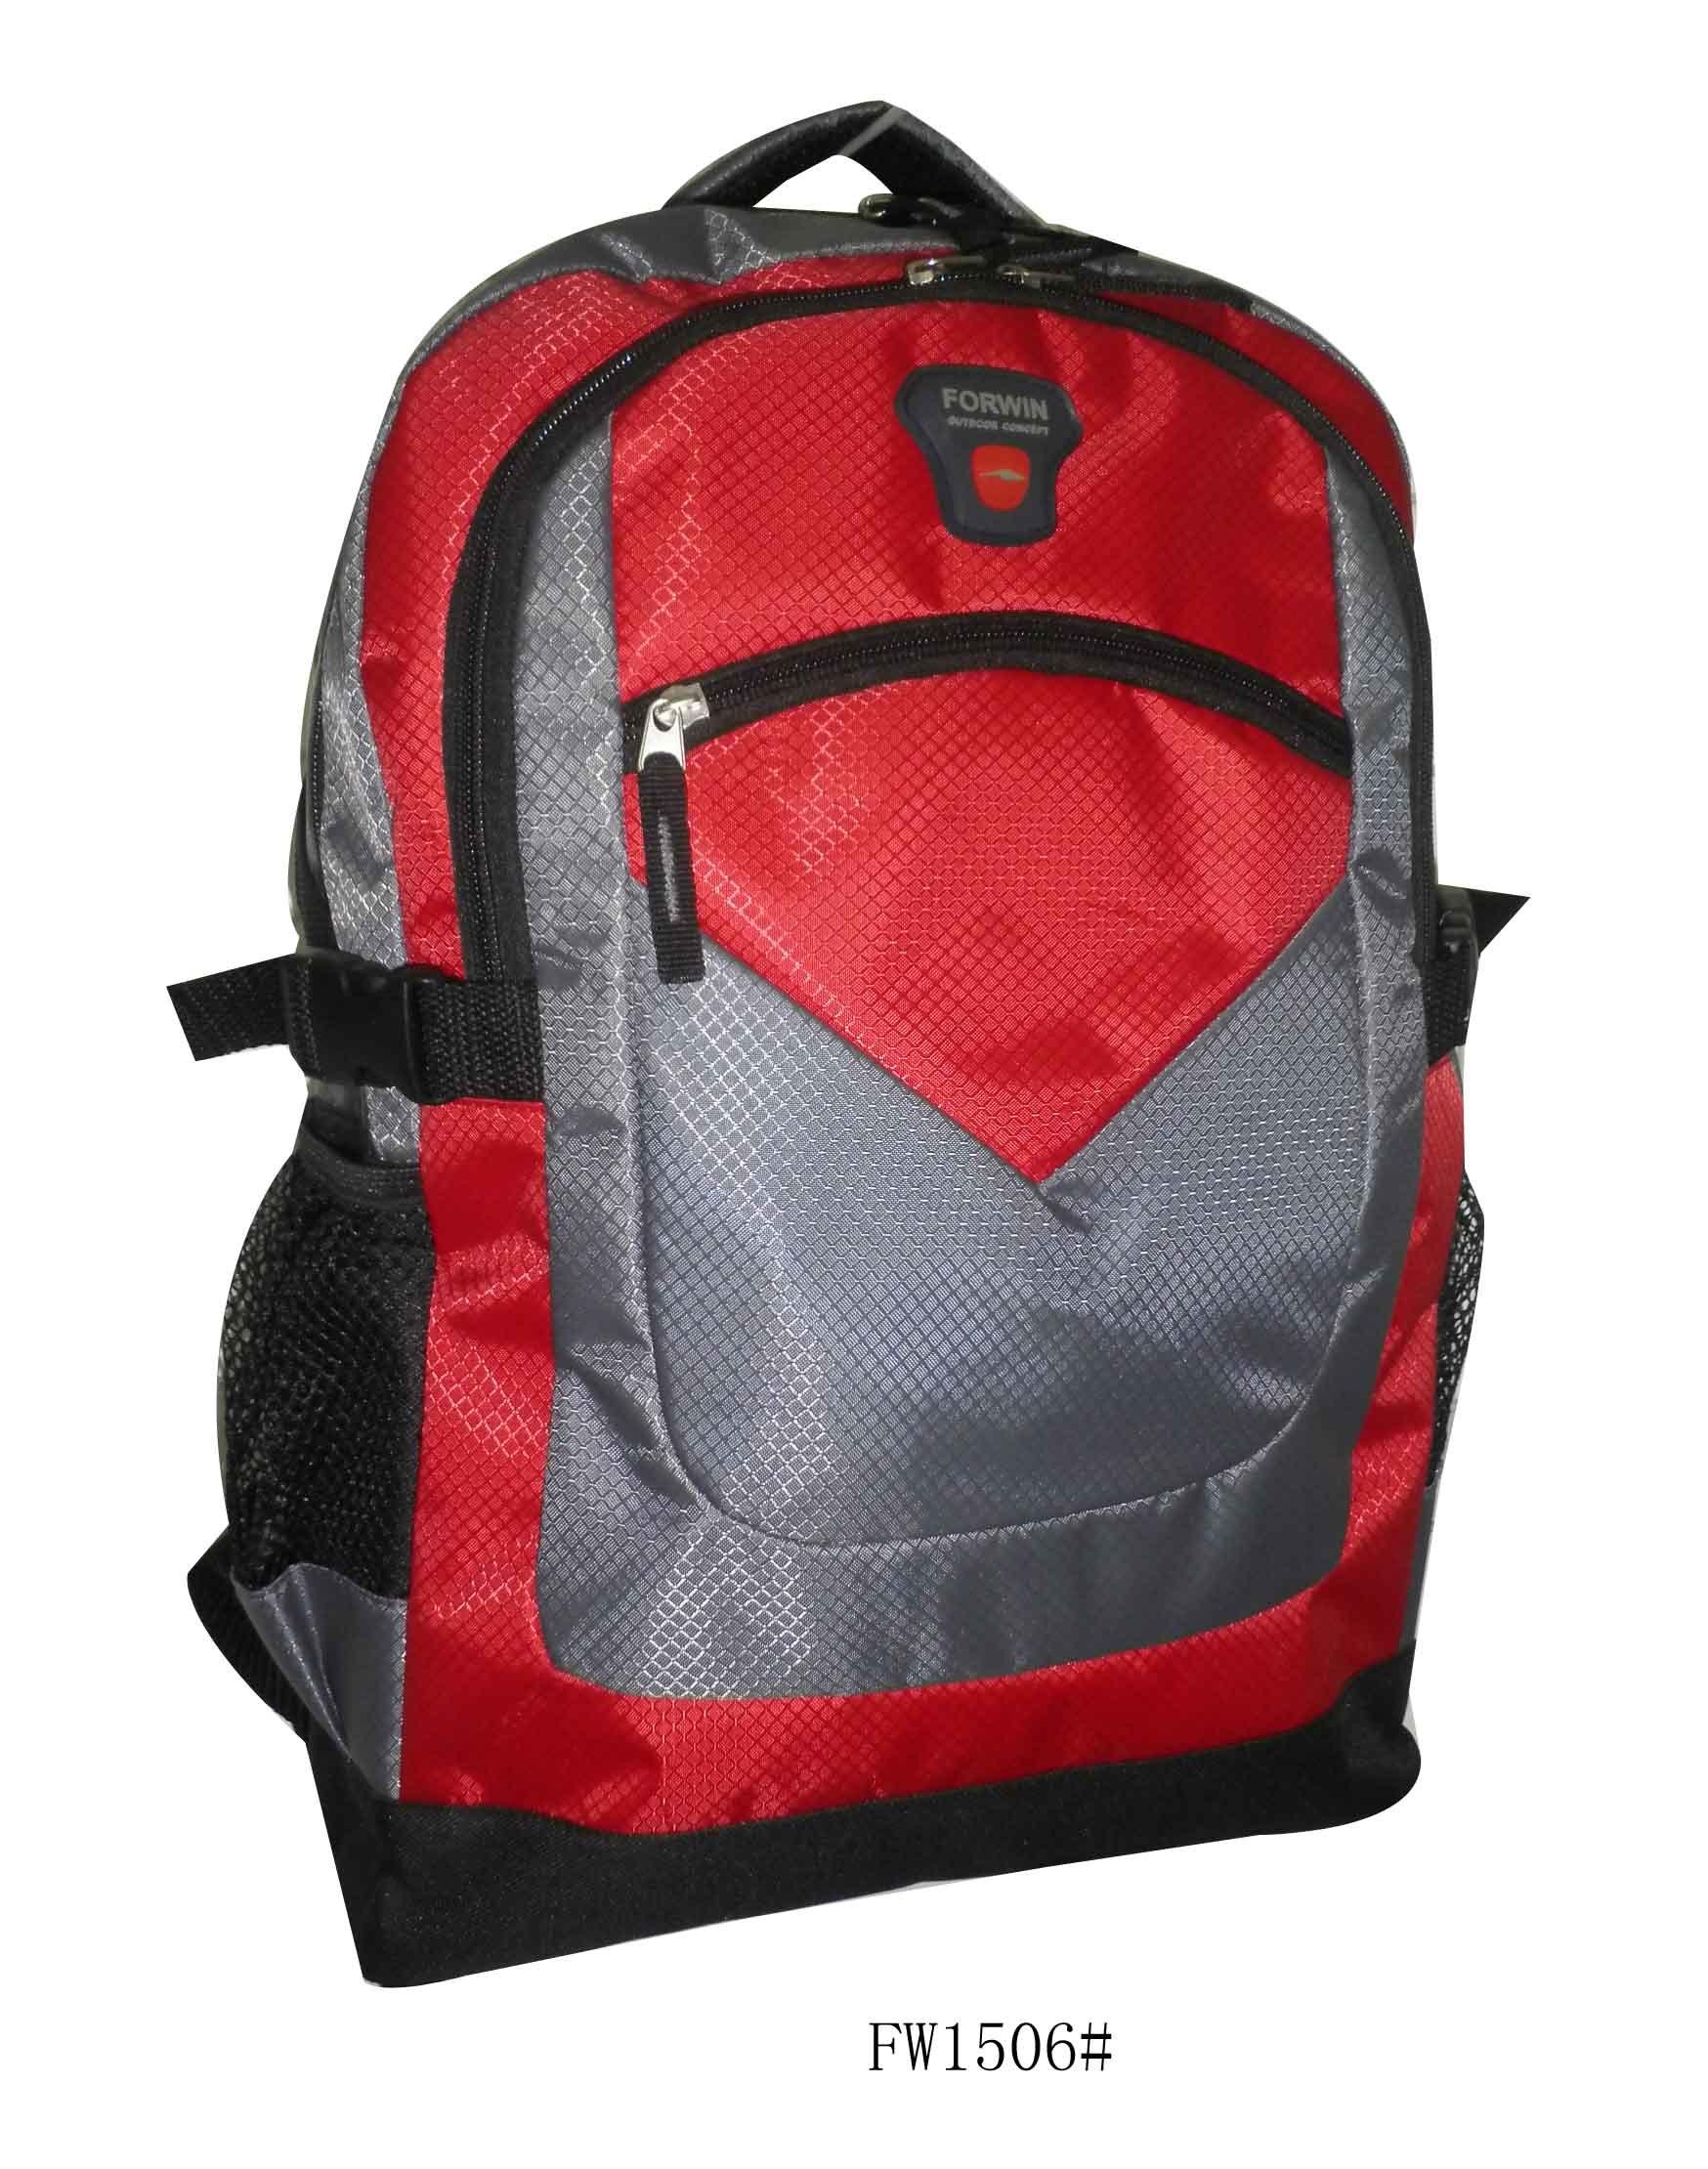 600D Rhombus Backpack (FW1506)